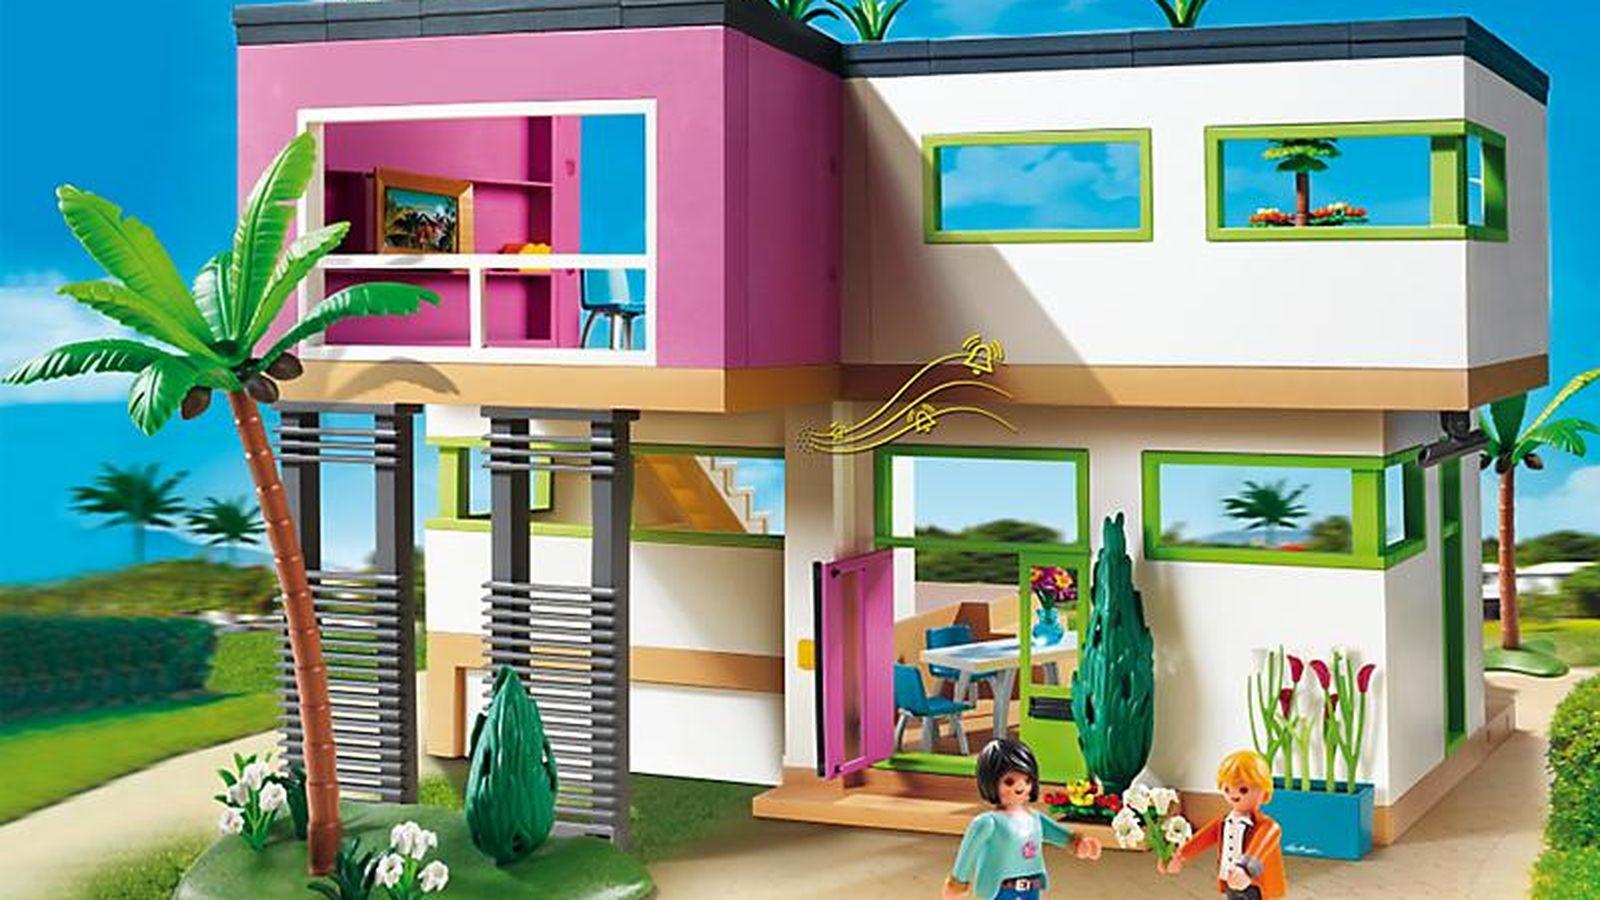 Vivienda la casa de lujo de playmobil valorada en 6 - Casas moviles de lujo ...